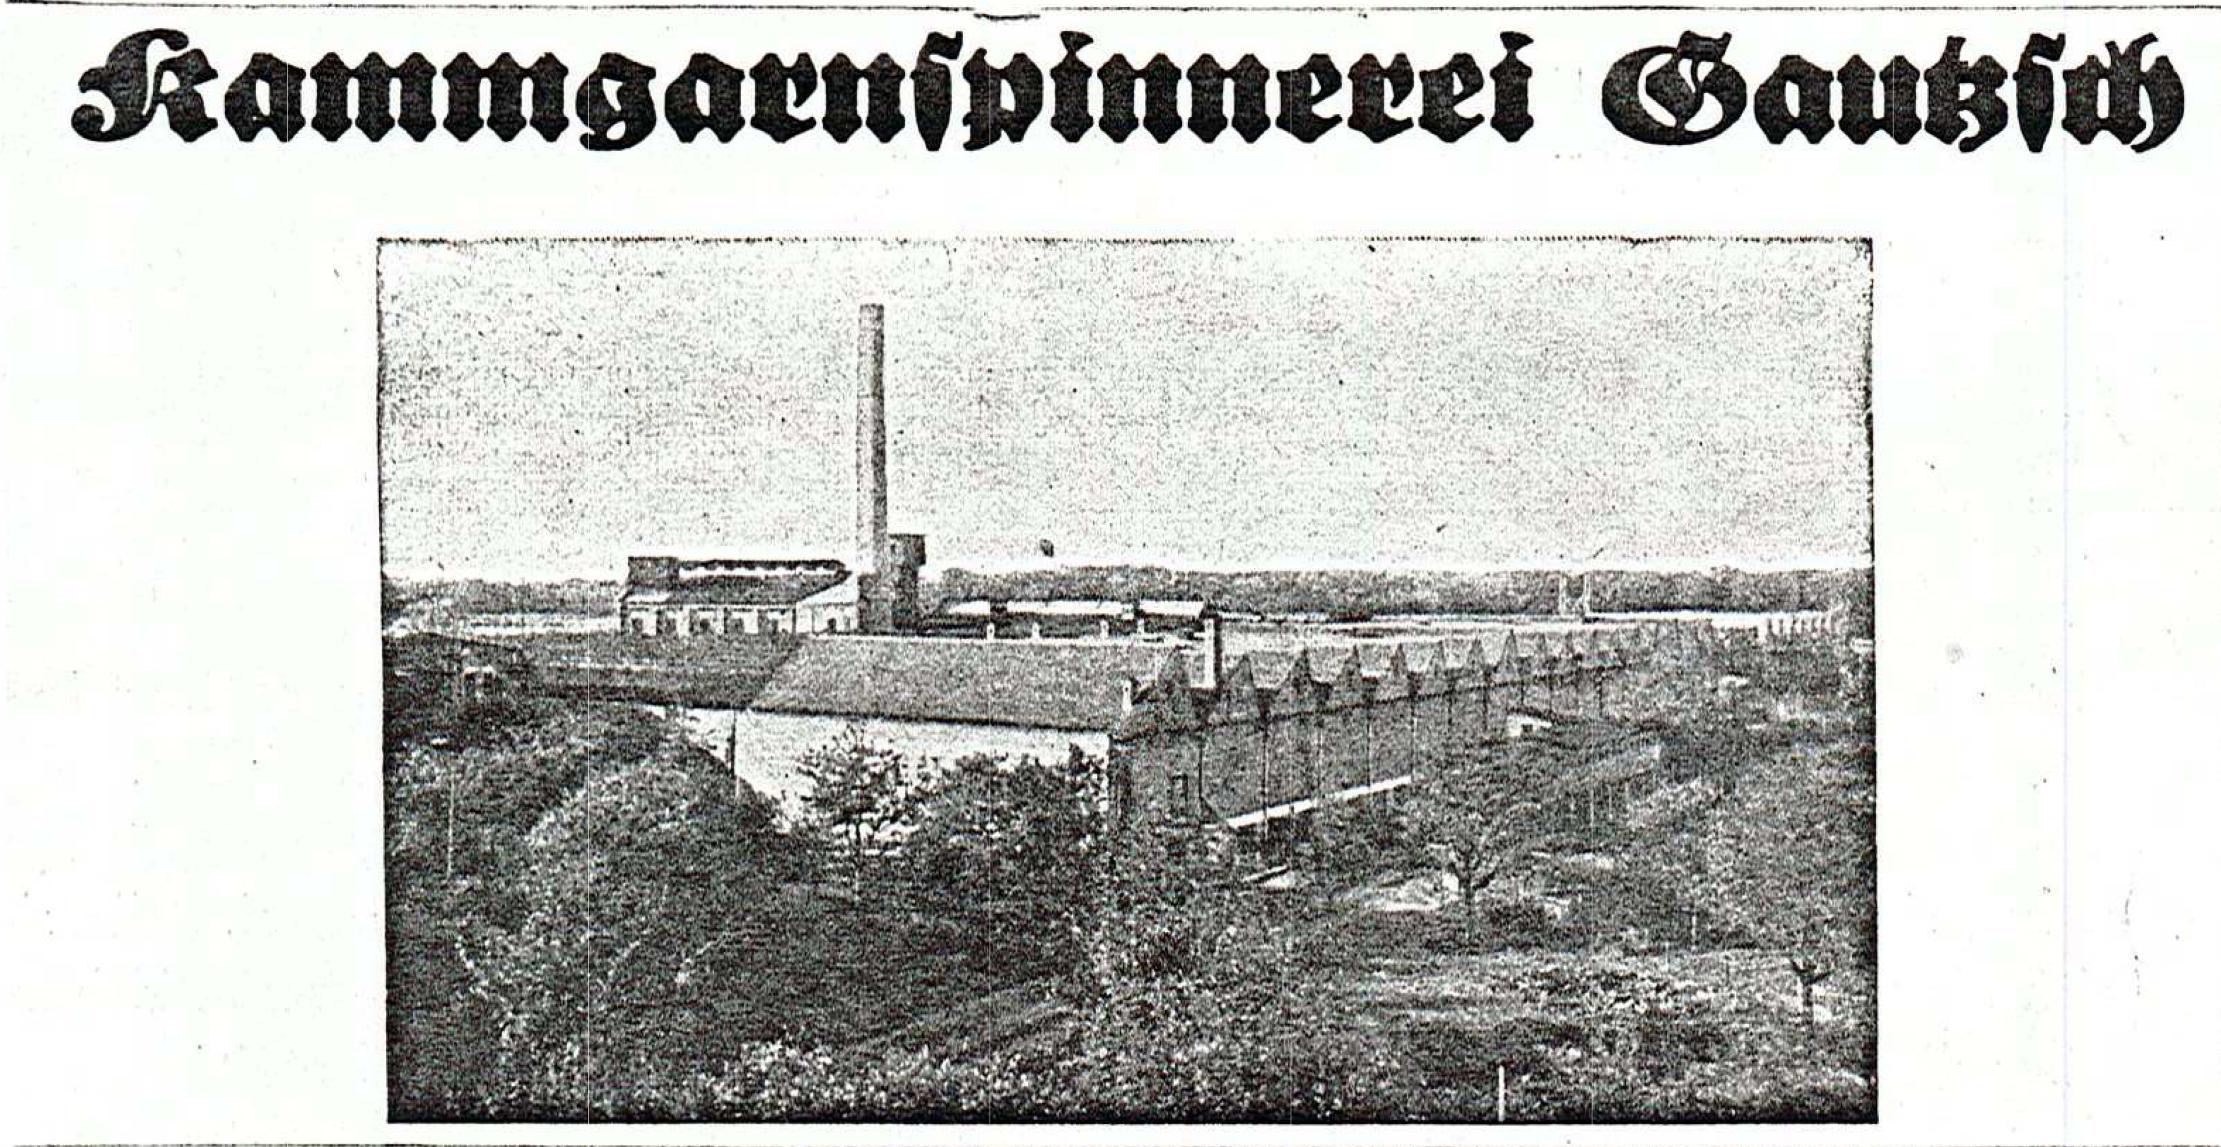 <a id='anker8' href='https://www.versteckte-geschichte-markkleeberg.de/quellenverzeichnis#zwangsarbeit8' target='_new'>Abb. 1: Kammgarnspinnerei Stöhr & Co.</a>